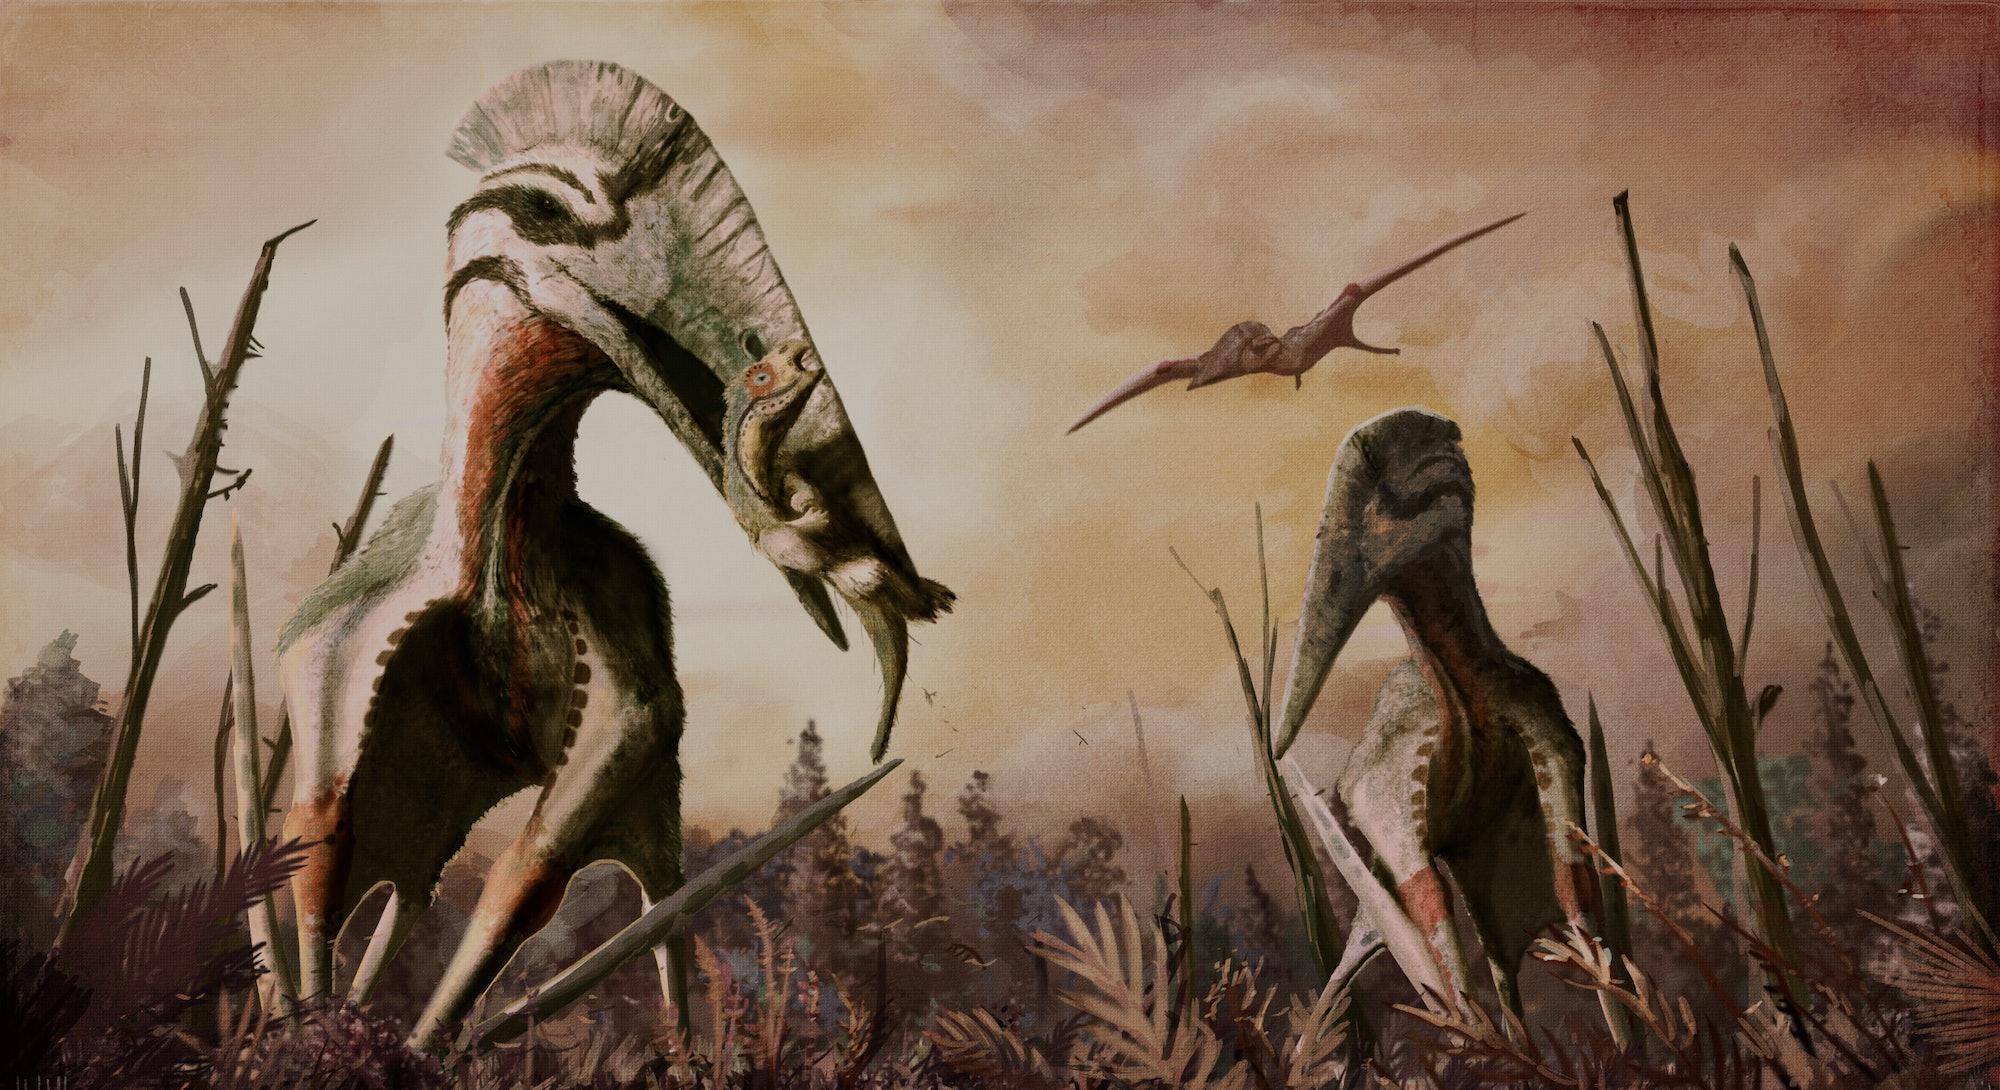 Maastrichtian, Transylvanian giant azhdarchid pterosaur Hatzegopteryx sp. preys on the rhabdodontid iguanodontian Zalmoxes